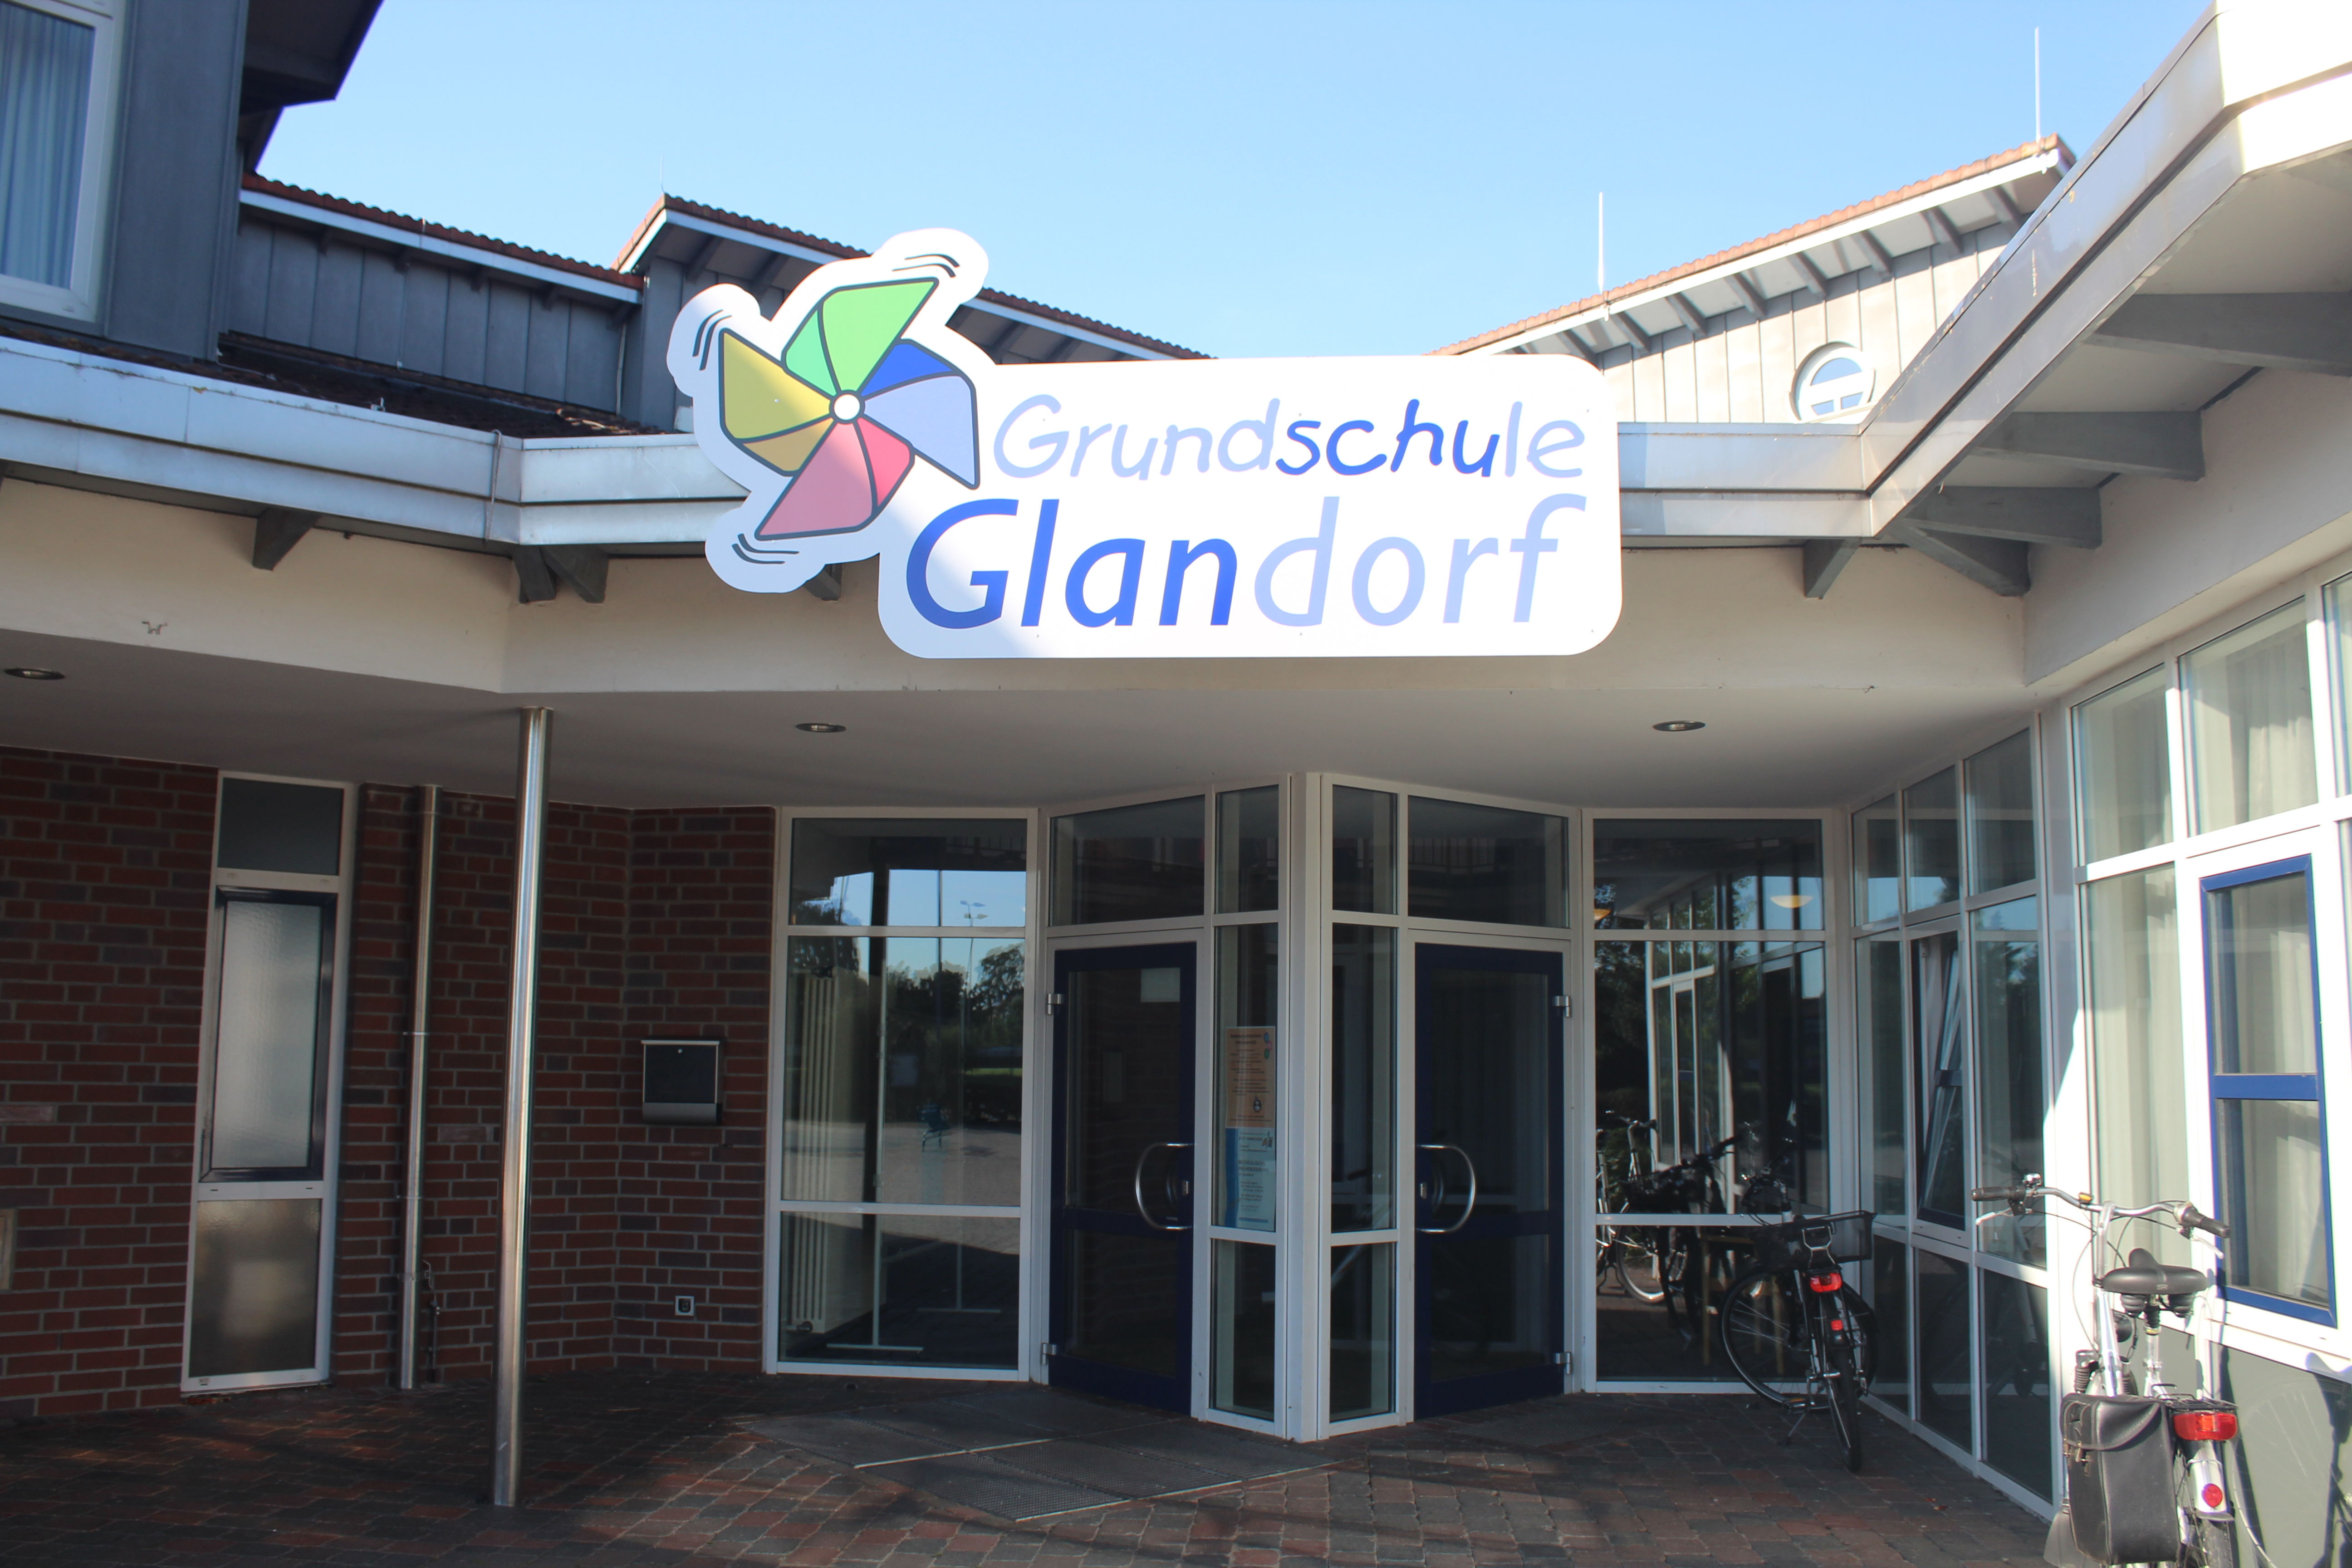 grundschule glandorf